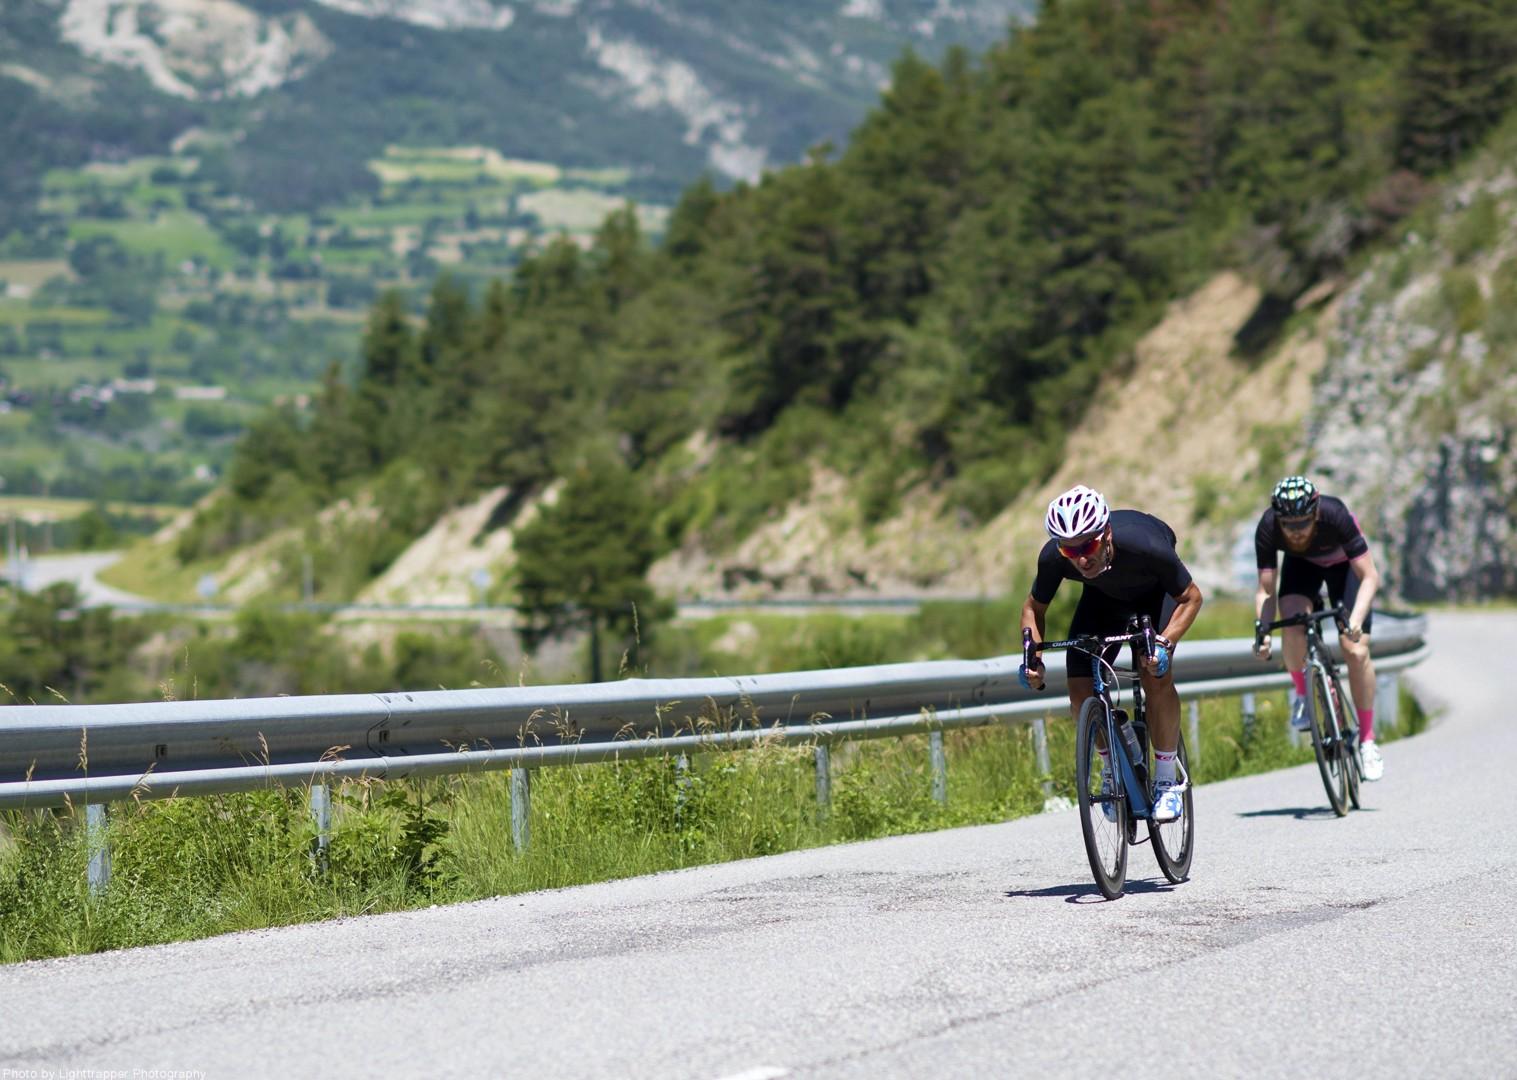 holiday-france-provence-road-cycling-col-climb.jpg - NEW! France - Provence - Alpes Maritimes - Road Cycling